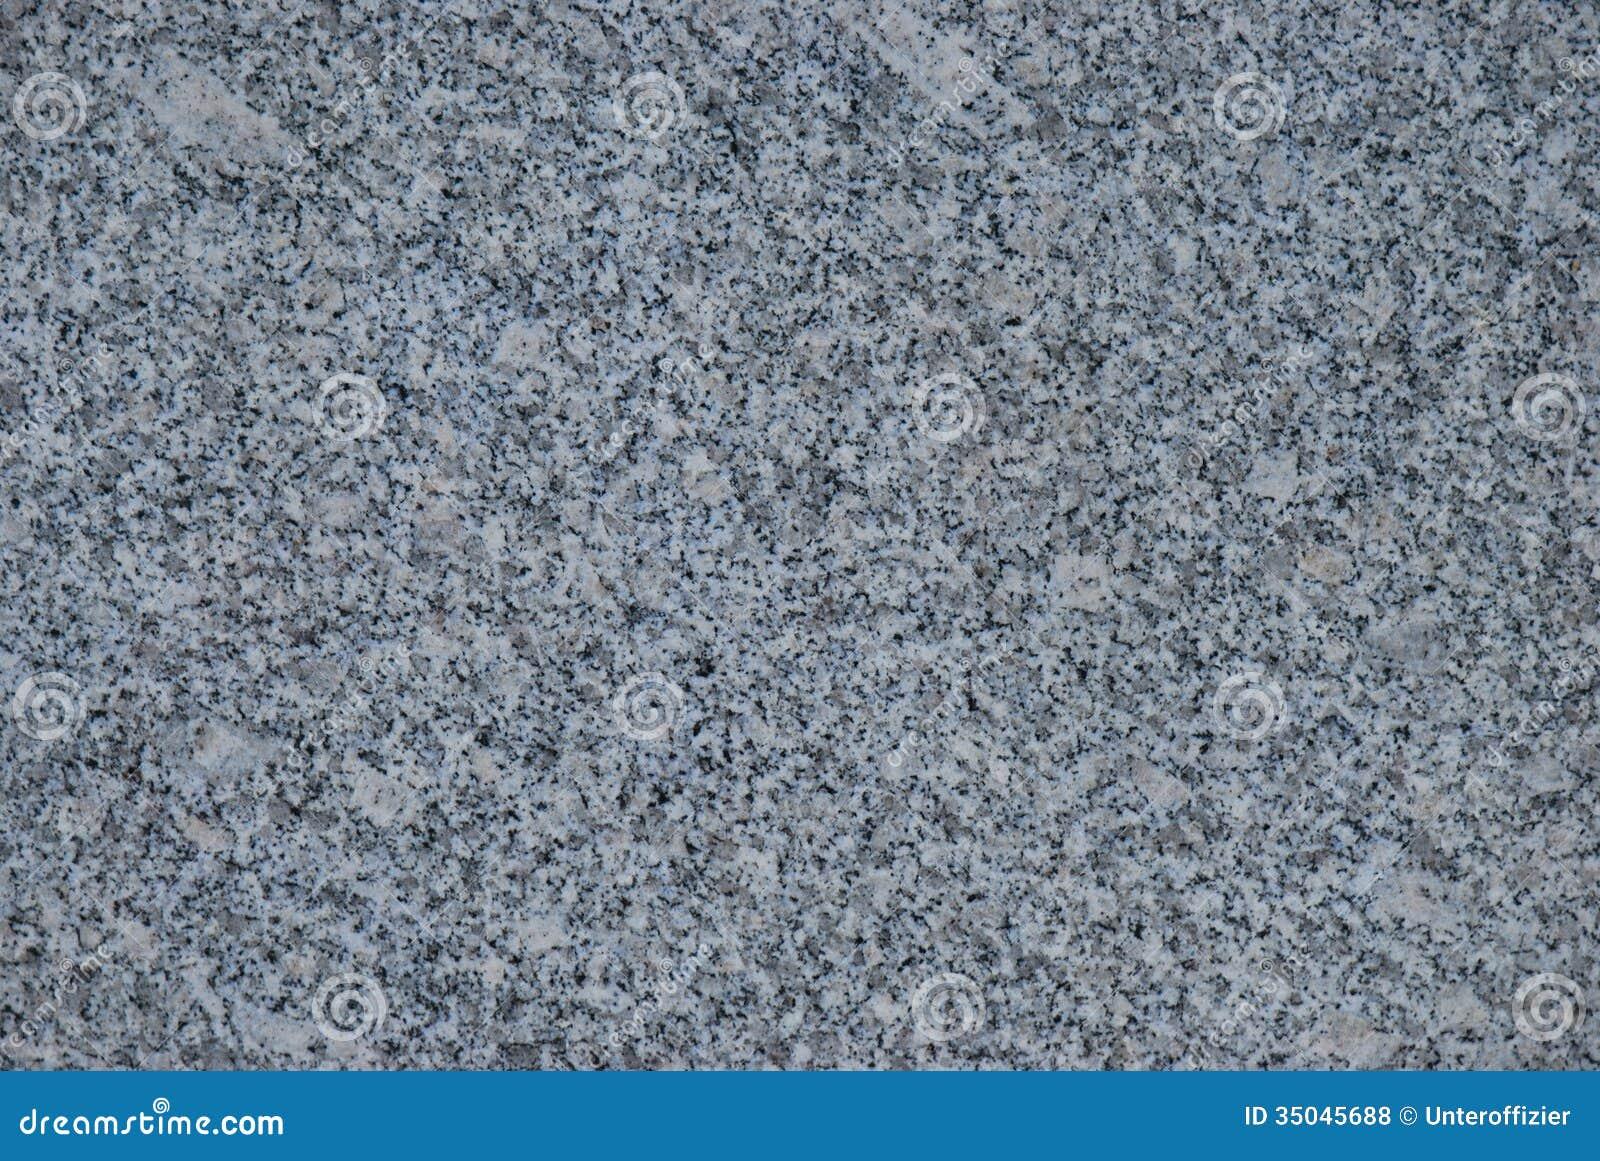 Polished Granite Royalty Free Stock Photos Image 35045688